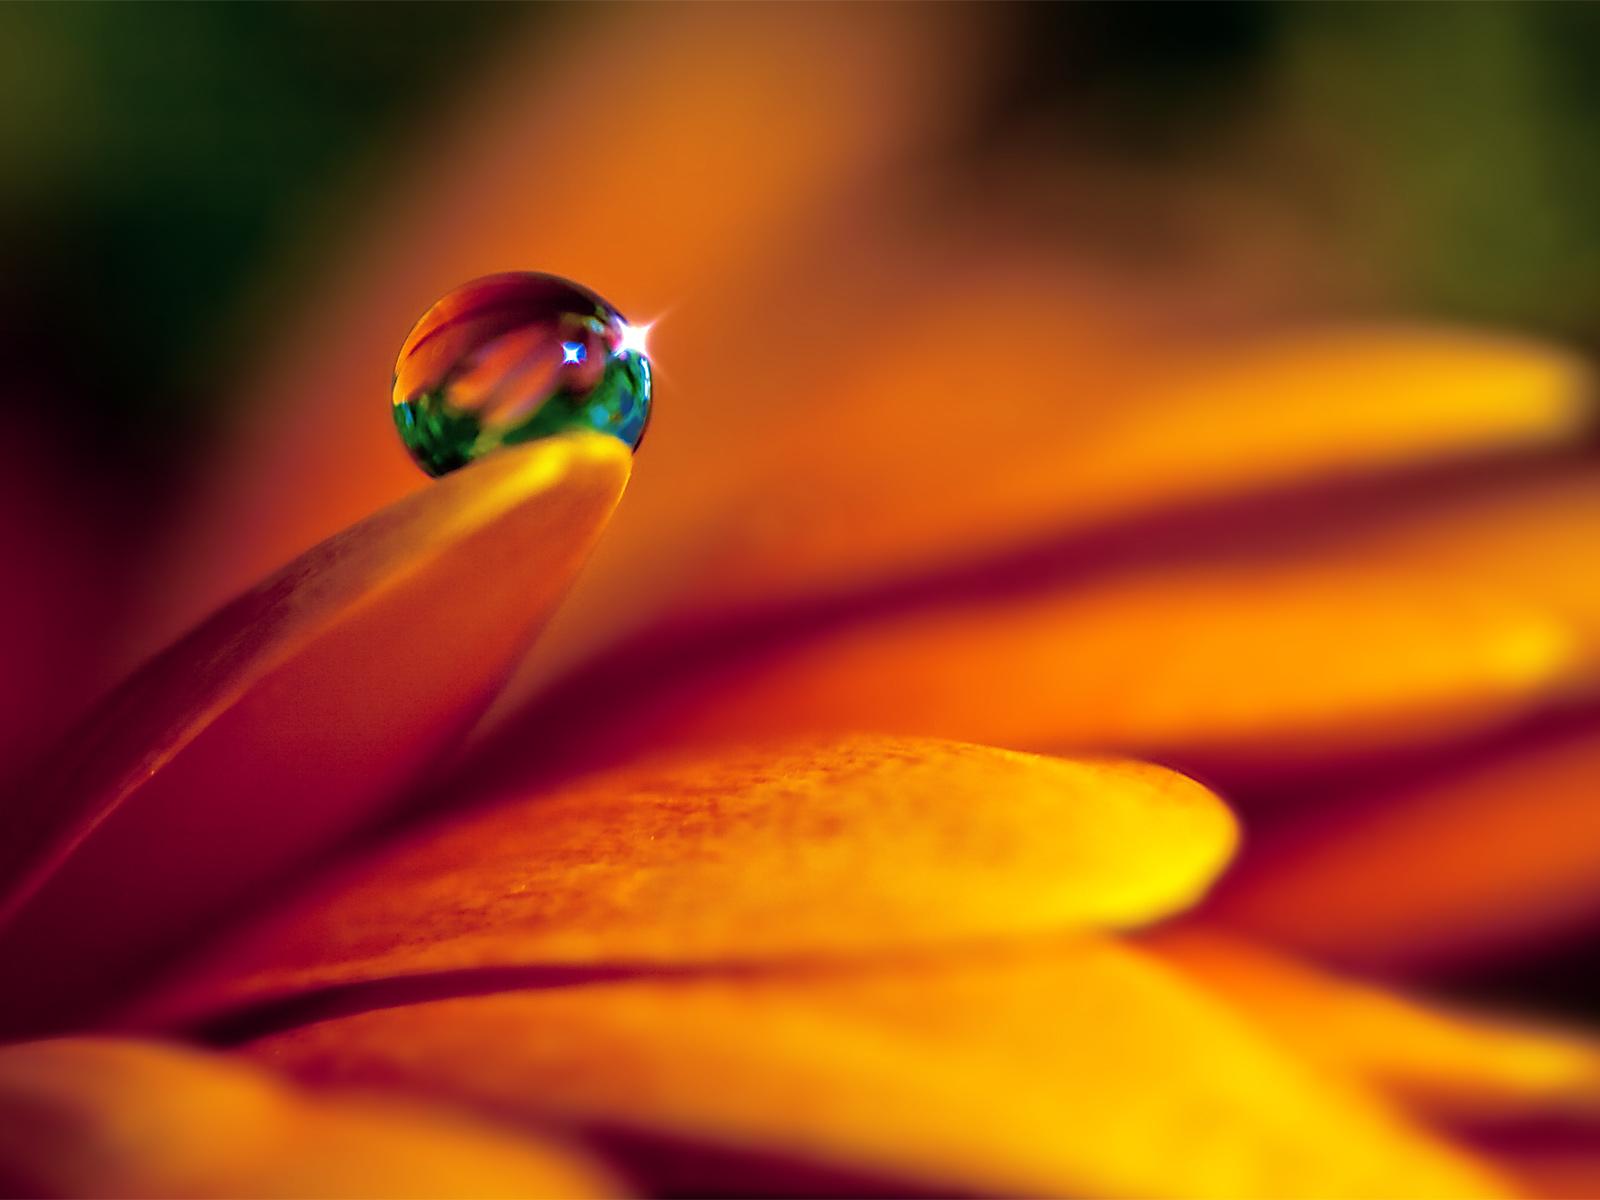 crystal dew drops